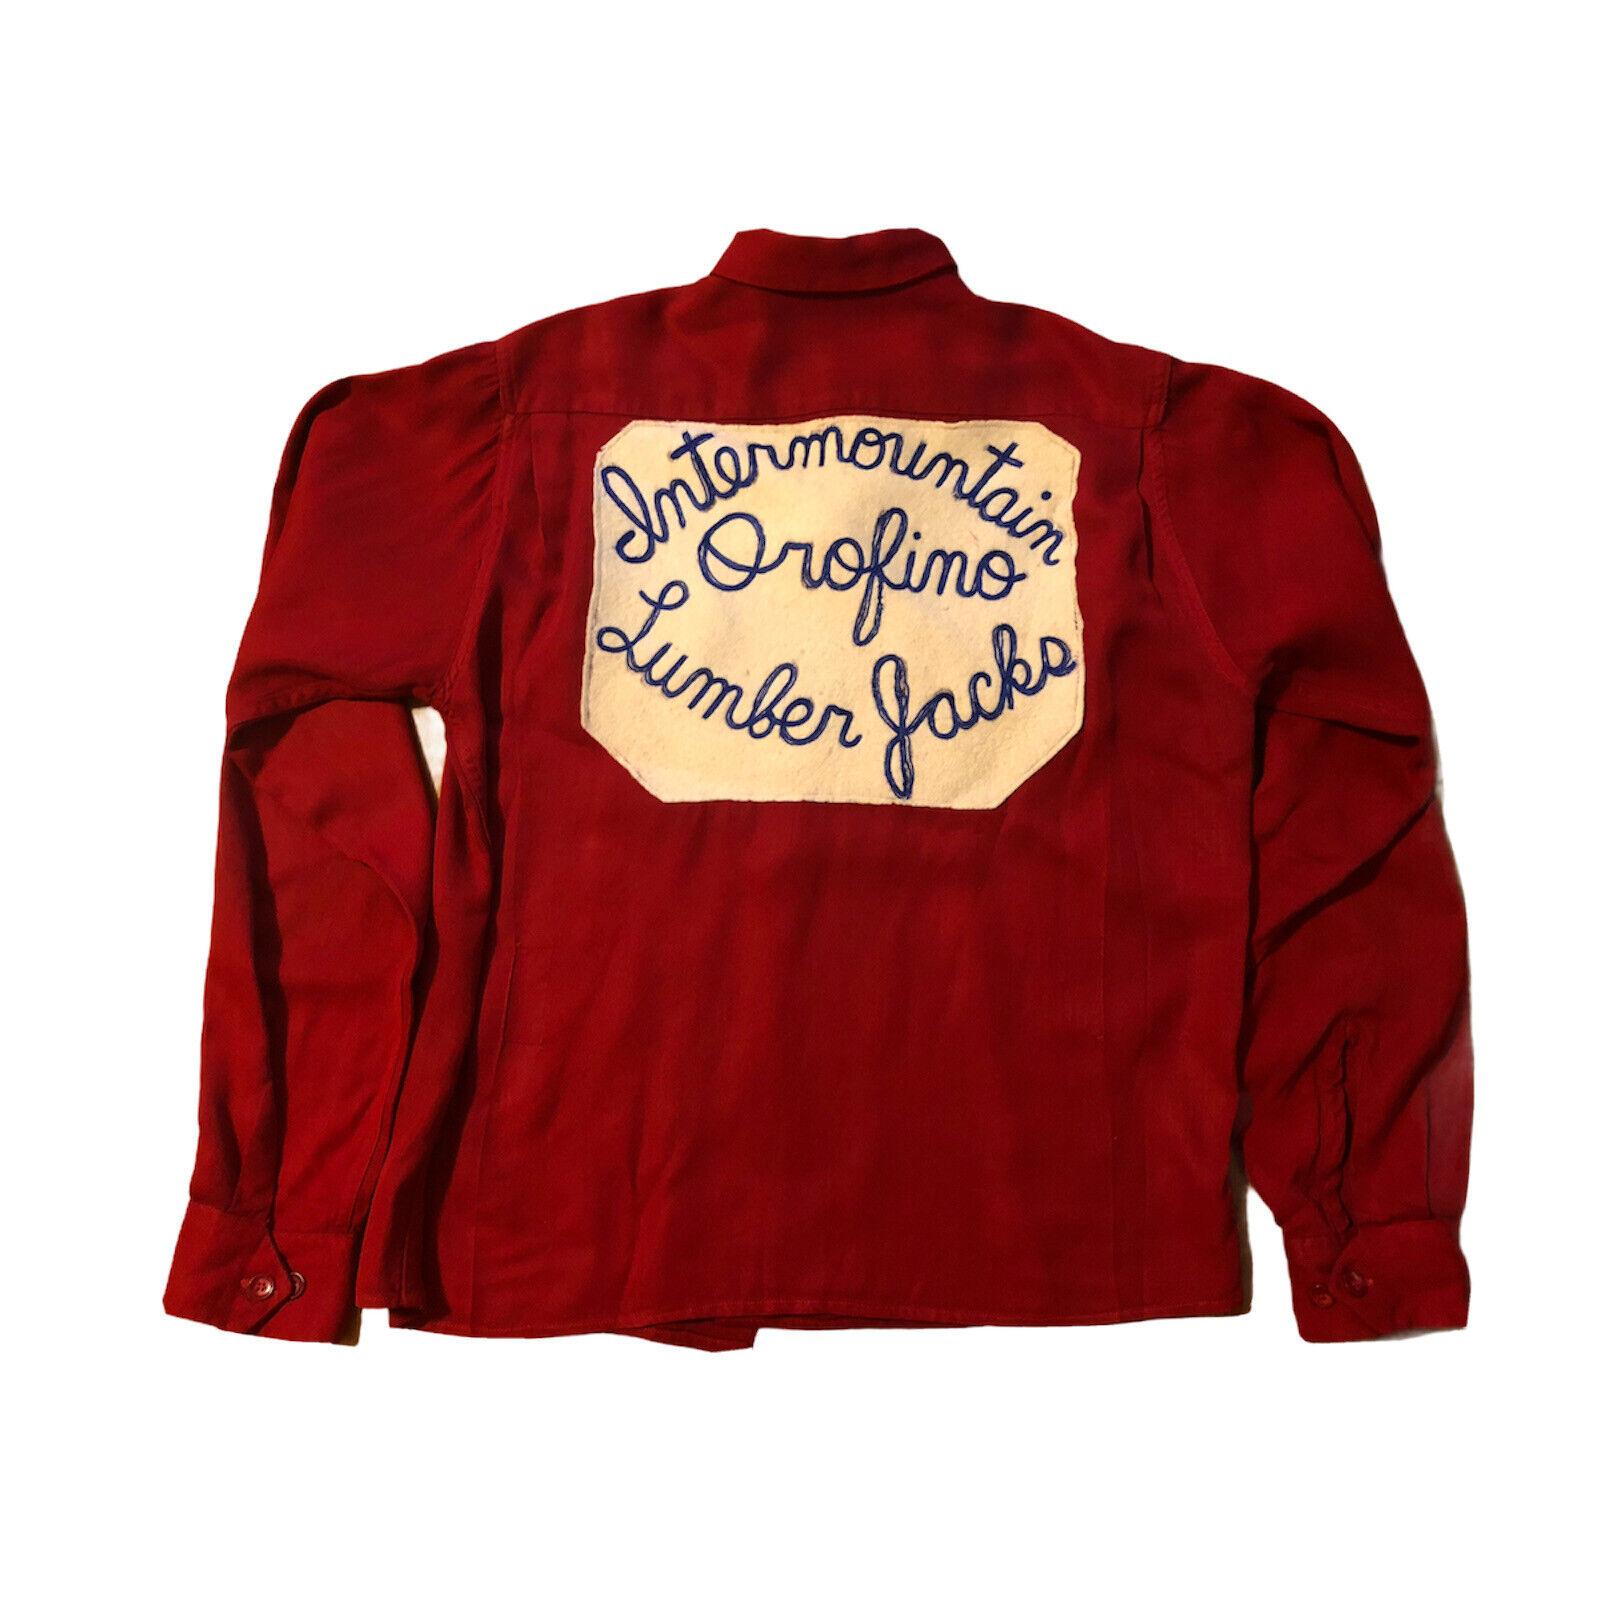 1950s Vintage Bowling Shirt Intermountain Orofino Idaho Lumberjacks Back Patch